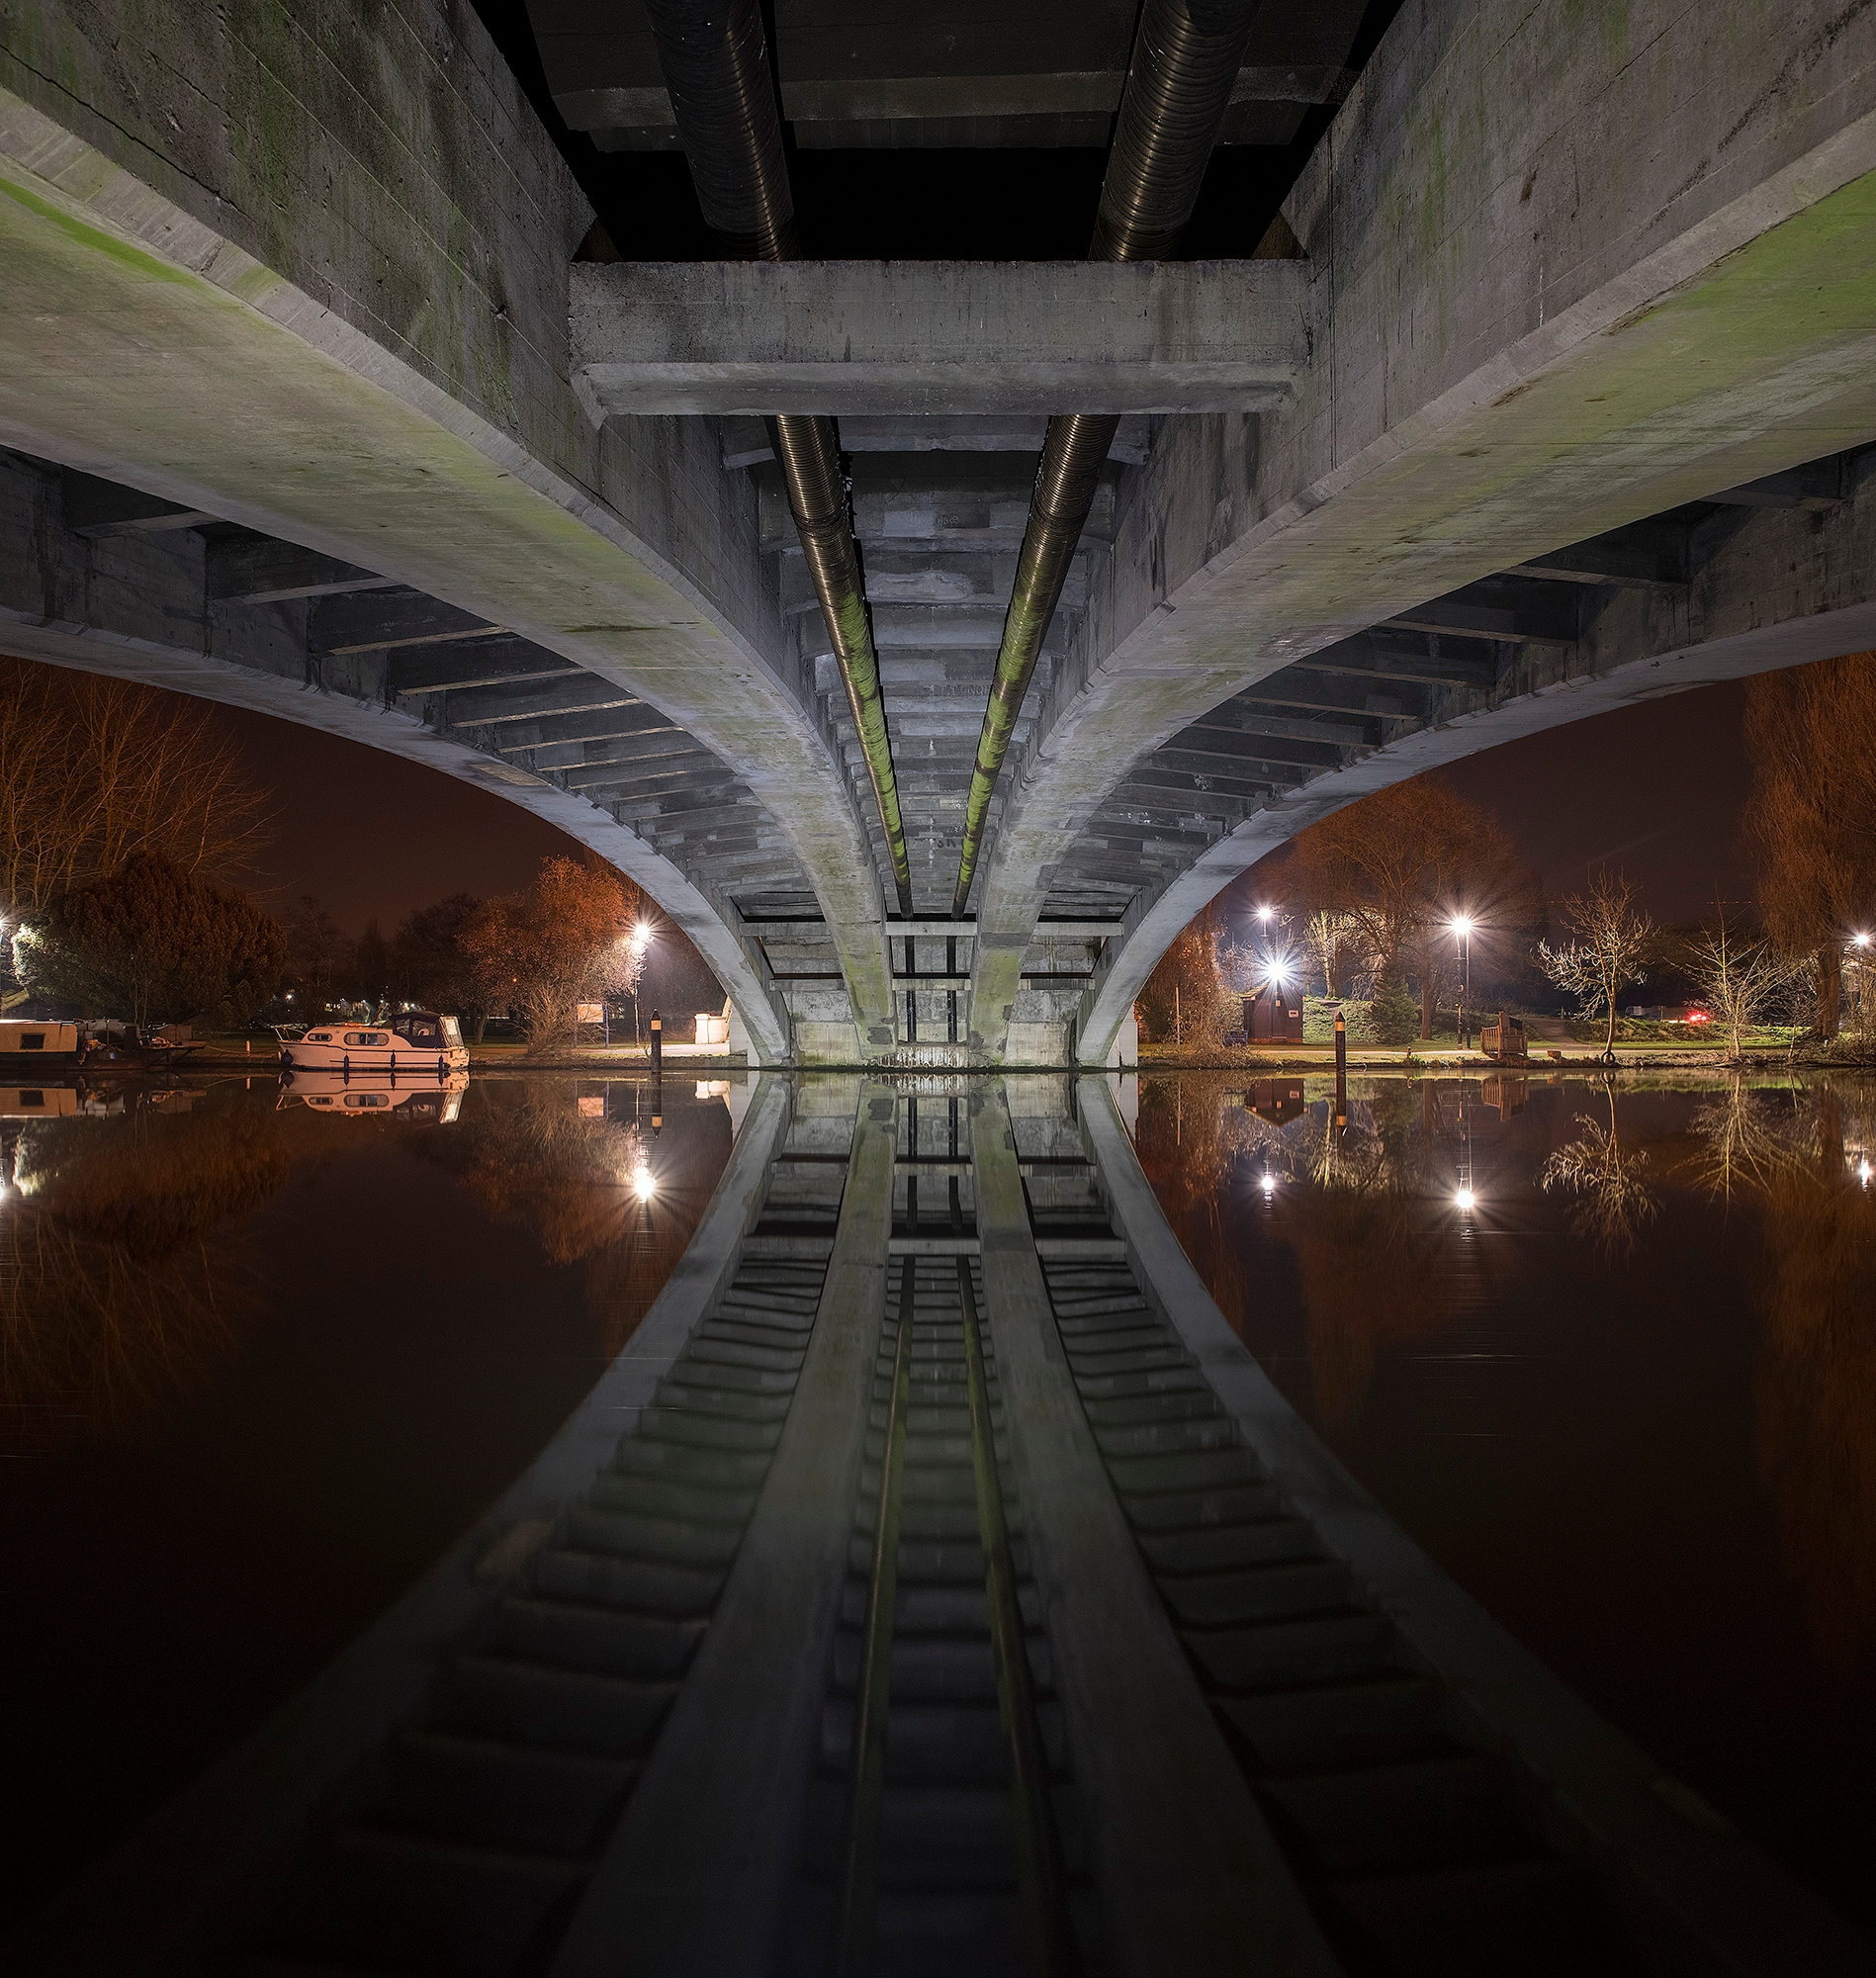 late night shots bridges Thames - forgottenheritage | ello